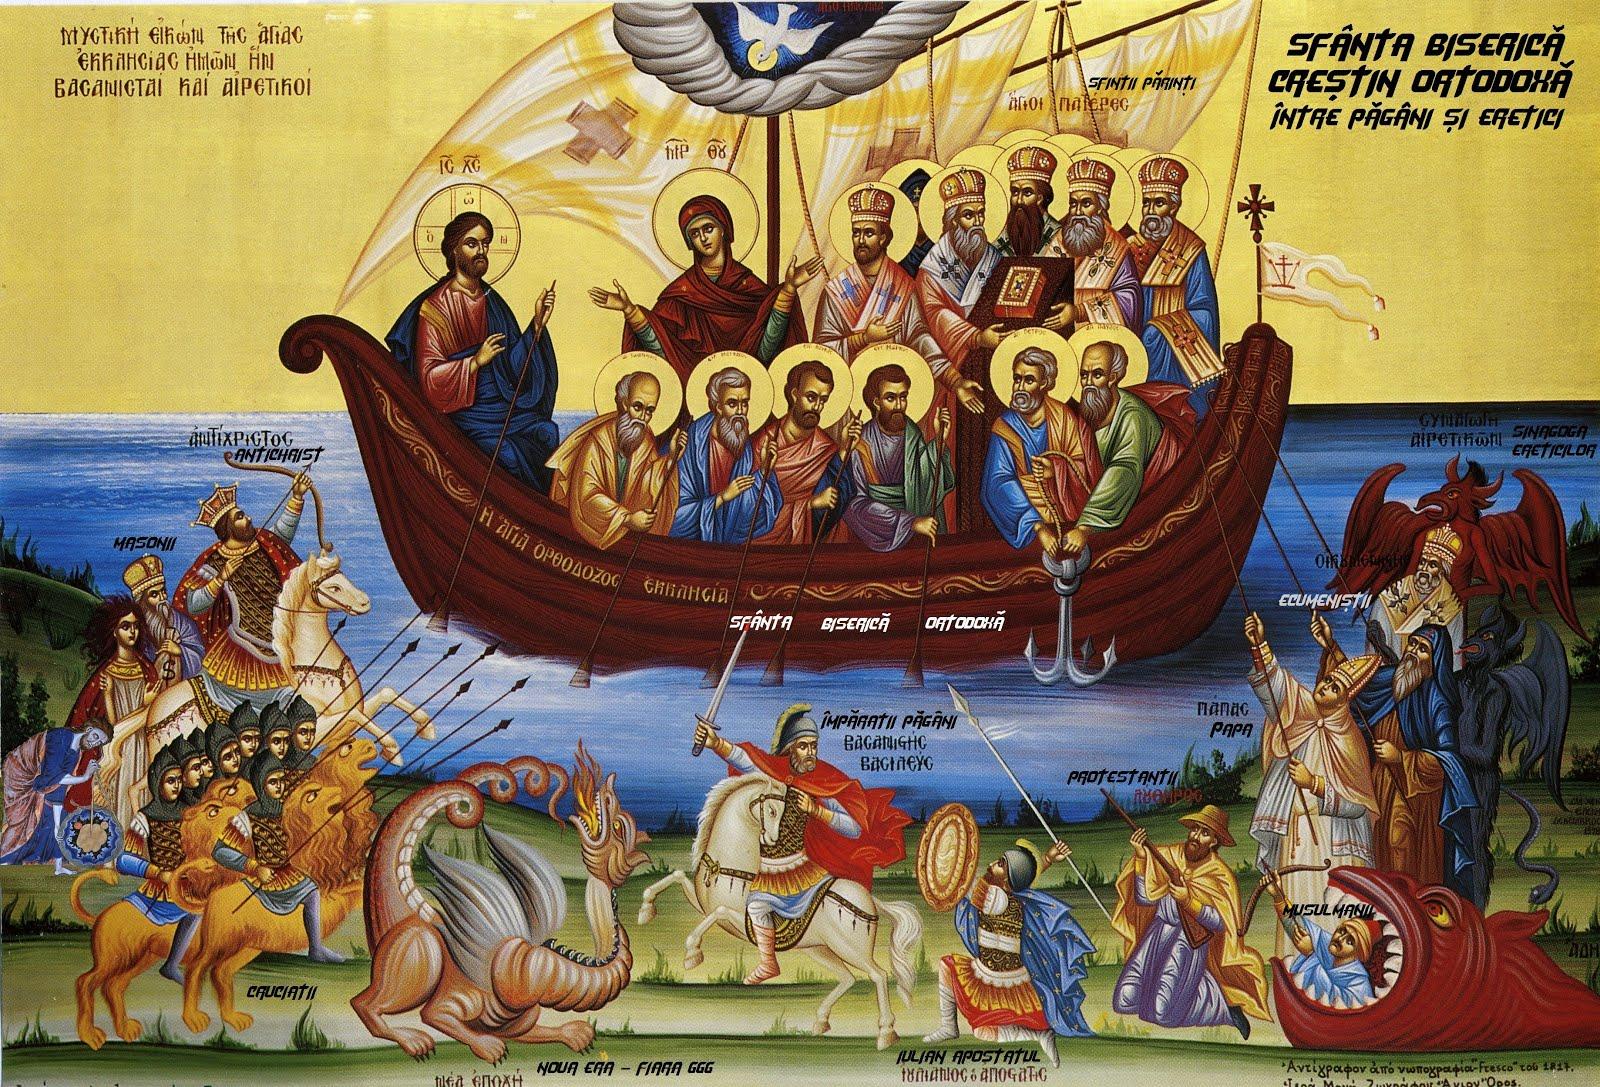 Corabia Ortodoxă